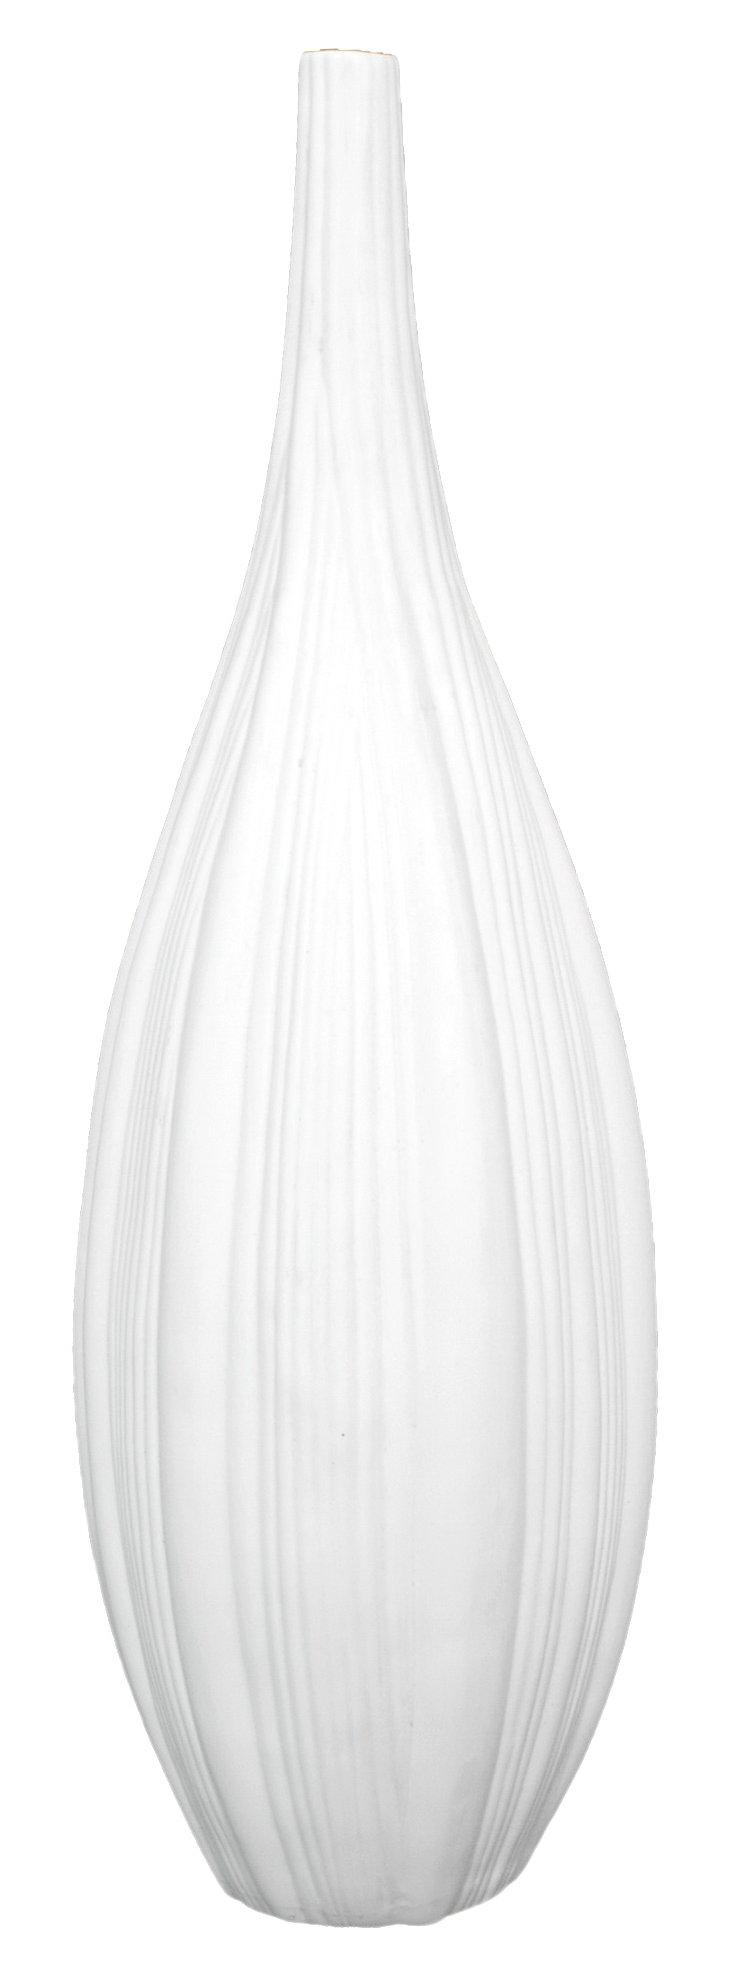 "20"" Matte Gourd Vase"